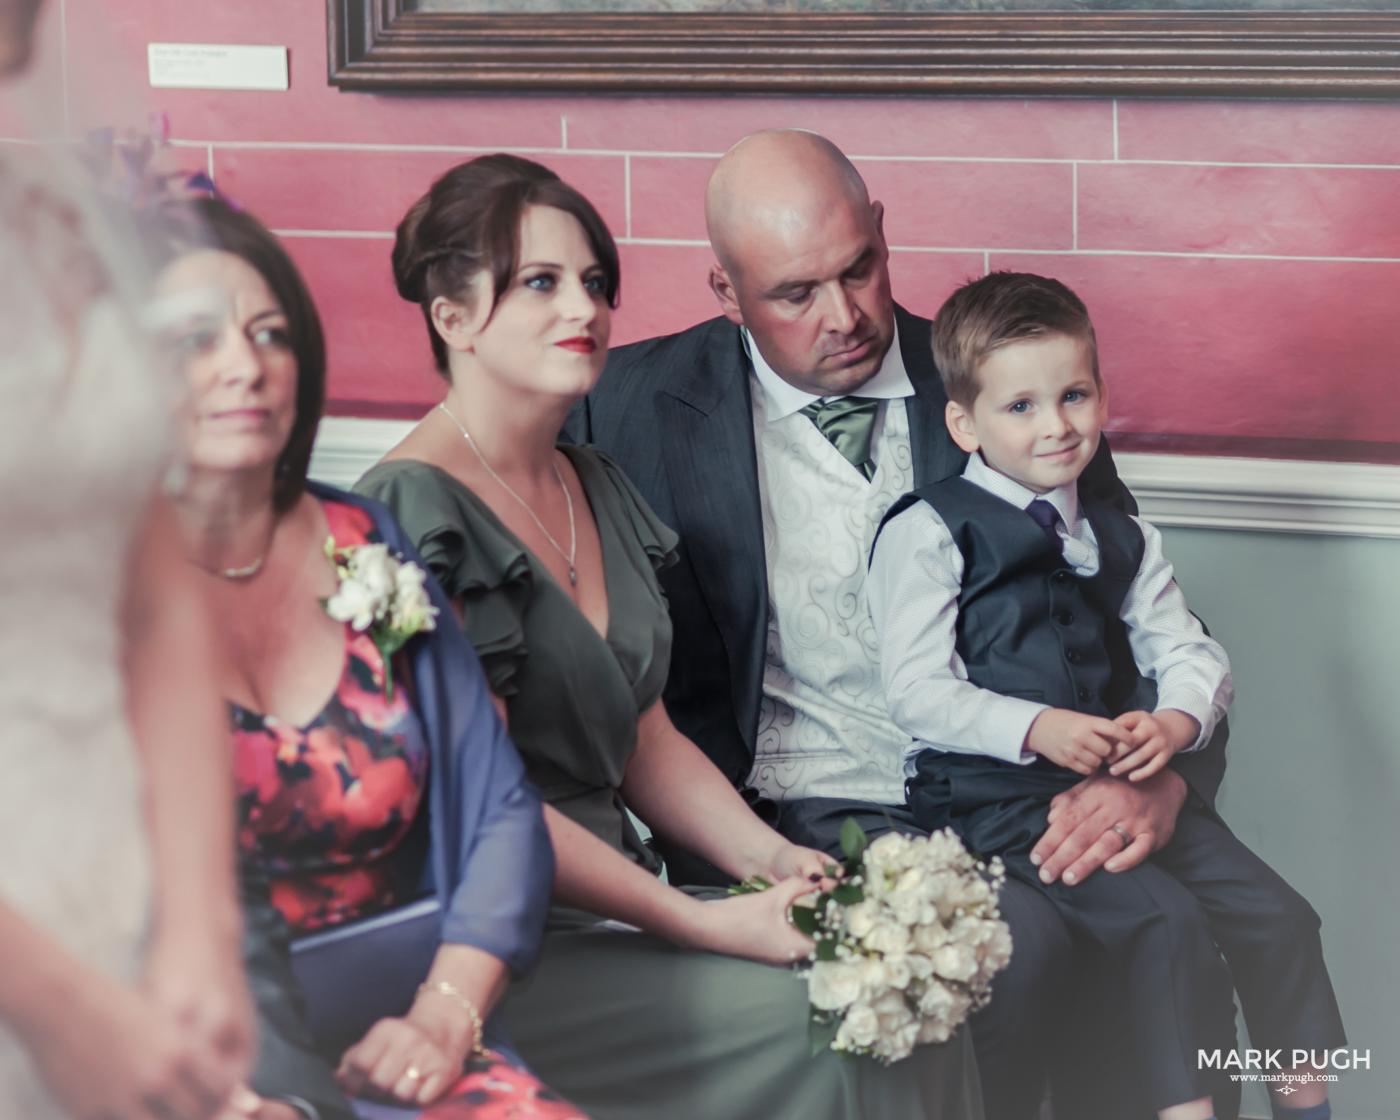 086- Laura and Peter - Wollaton Hall Wedding Nottingham UK by Mark Pugh www.markpugh.com.jpg